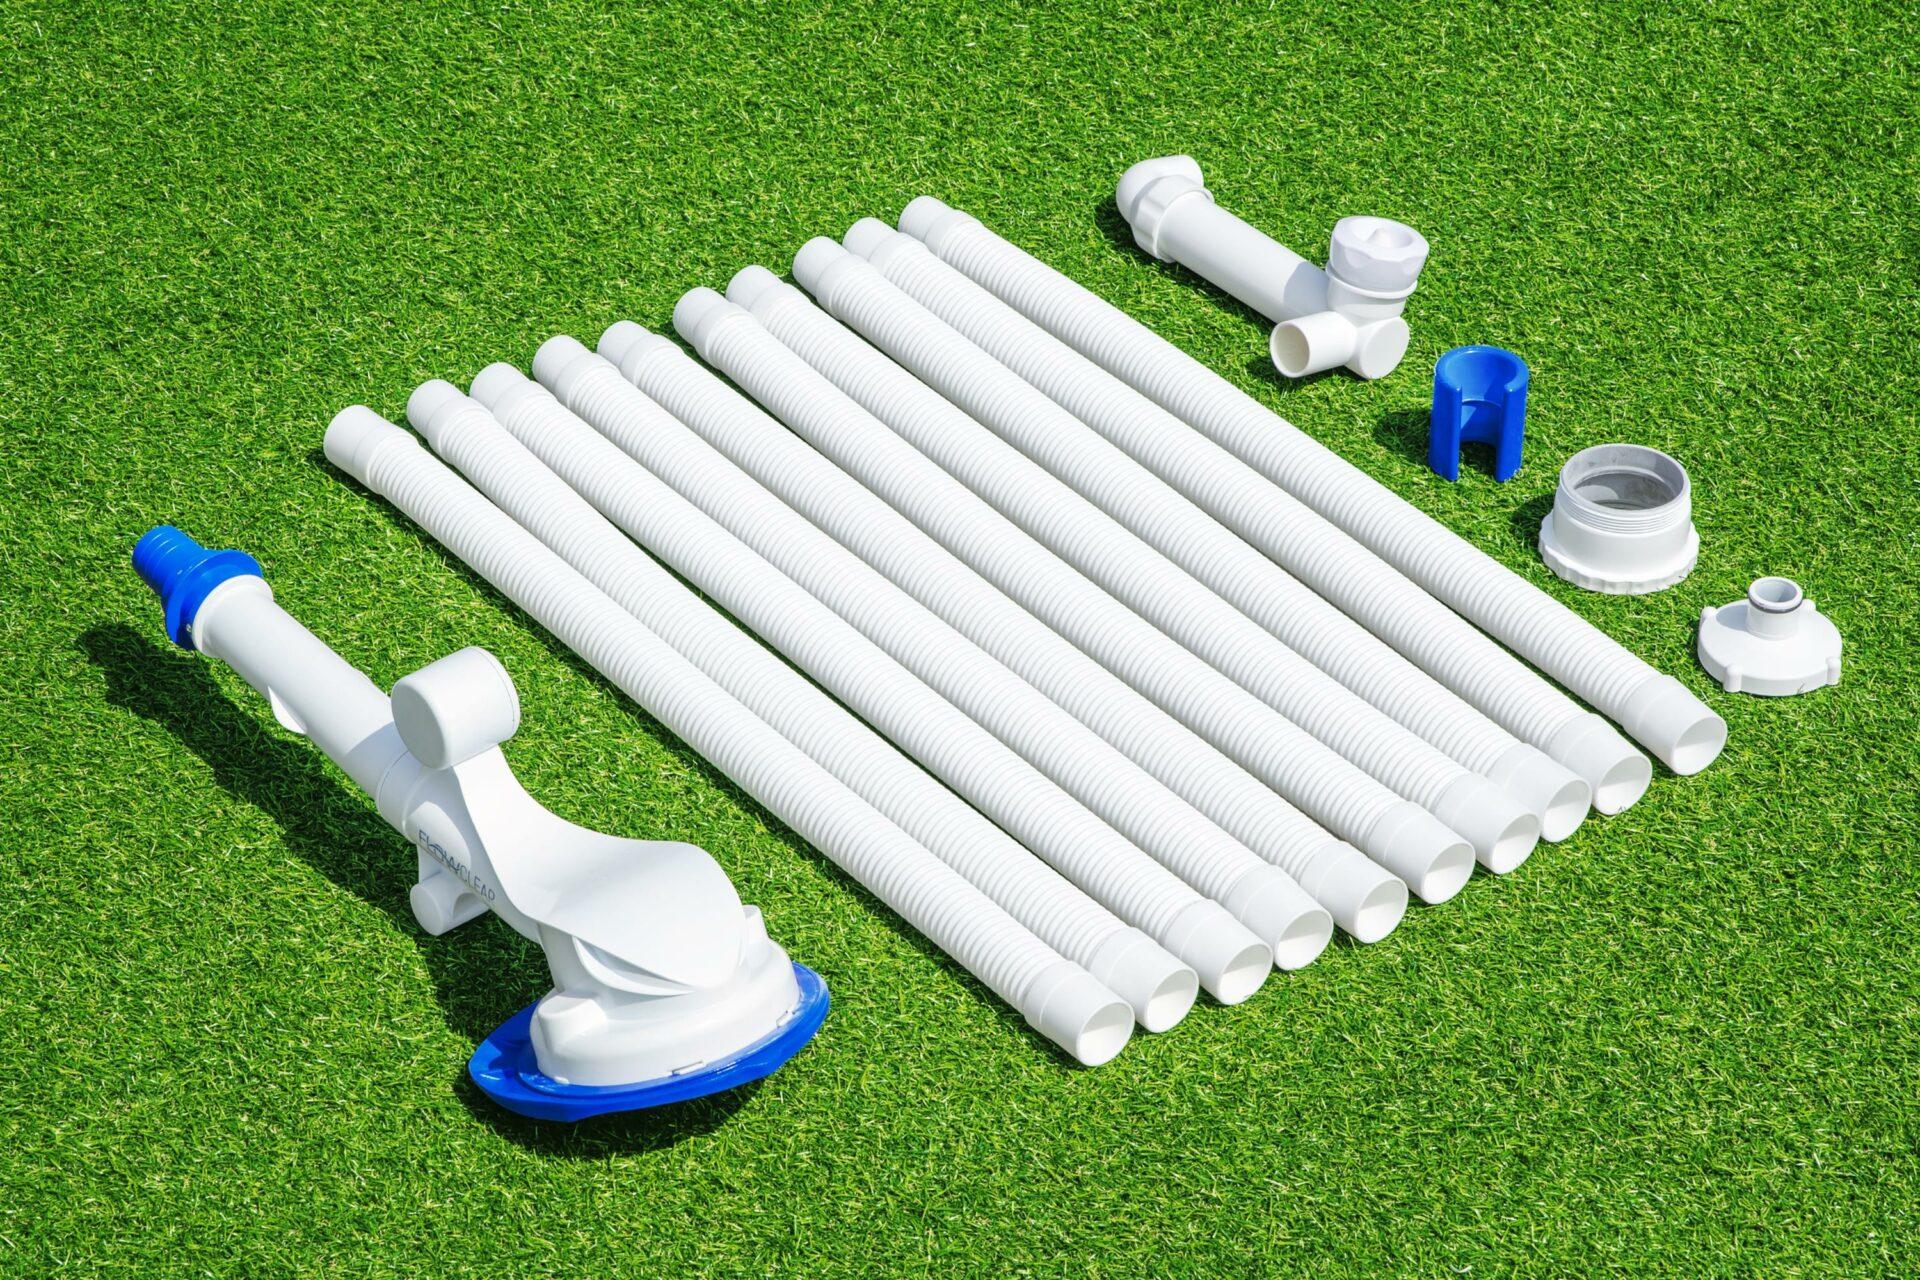 Flowclear™ AquaSweeper medfølgende i pakken